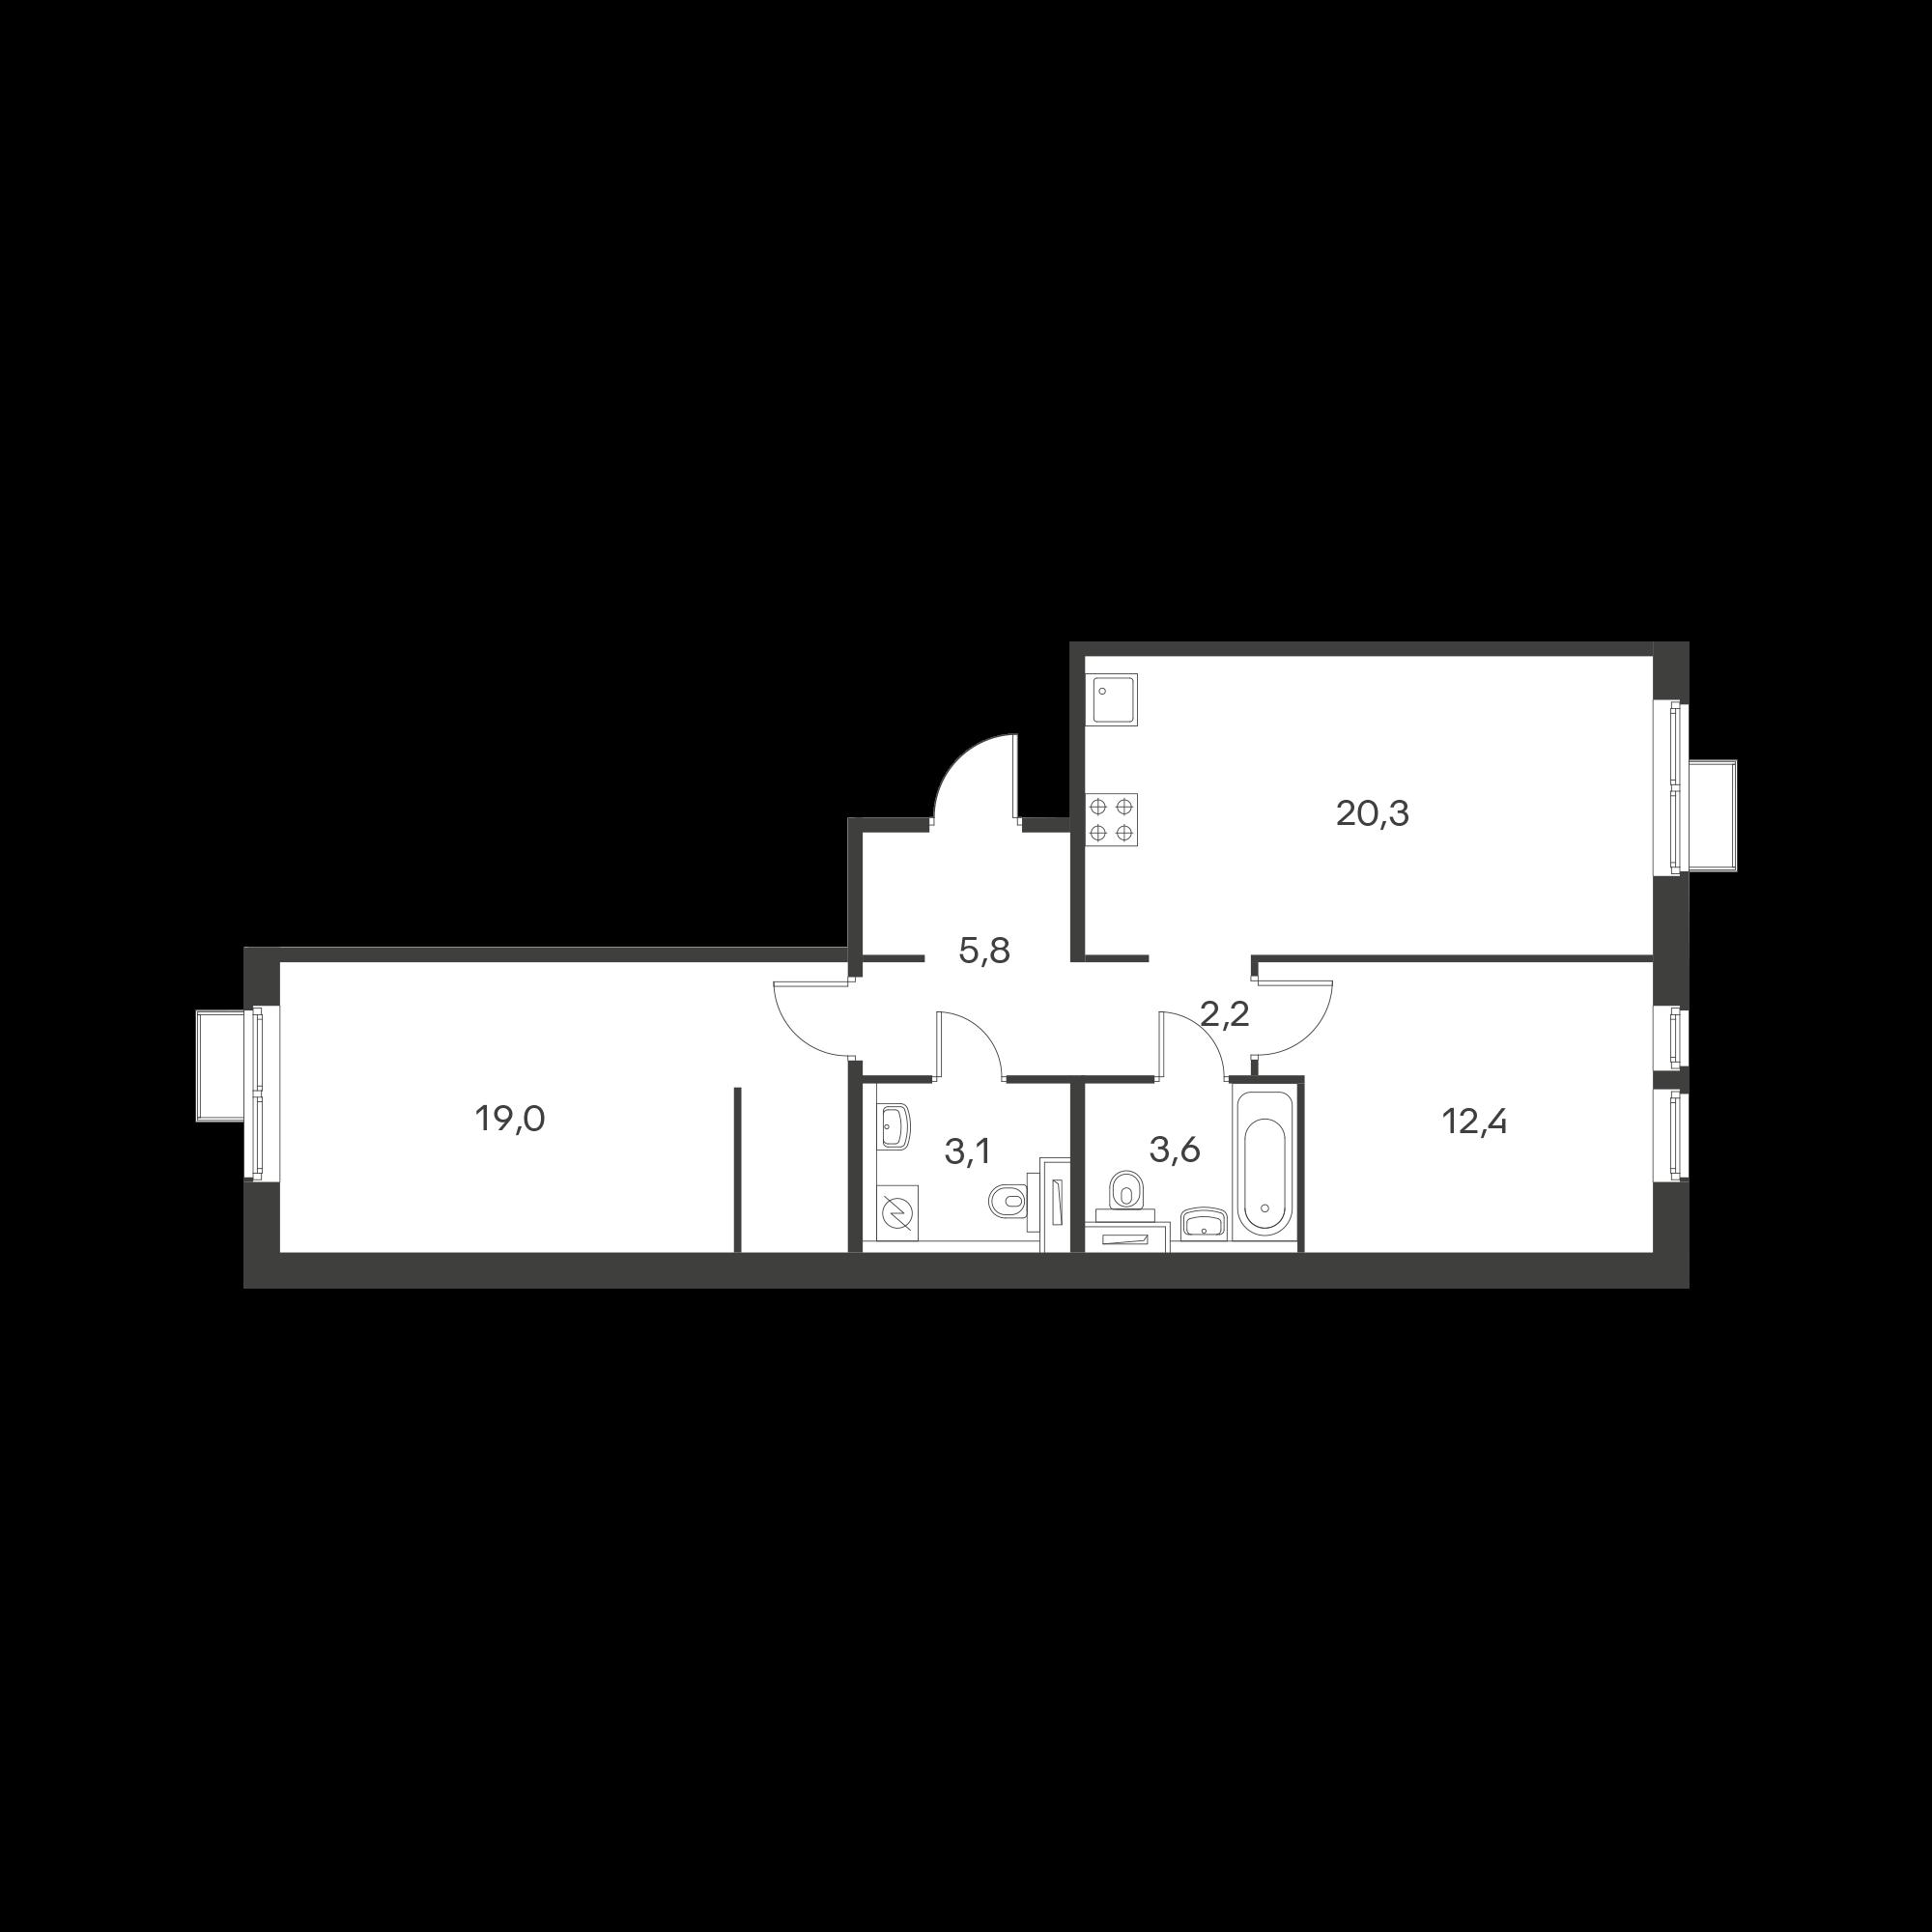 2EL3_6.9-1